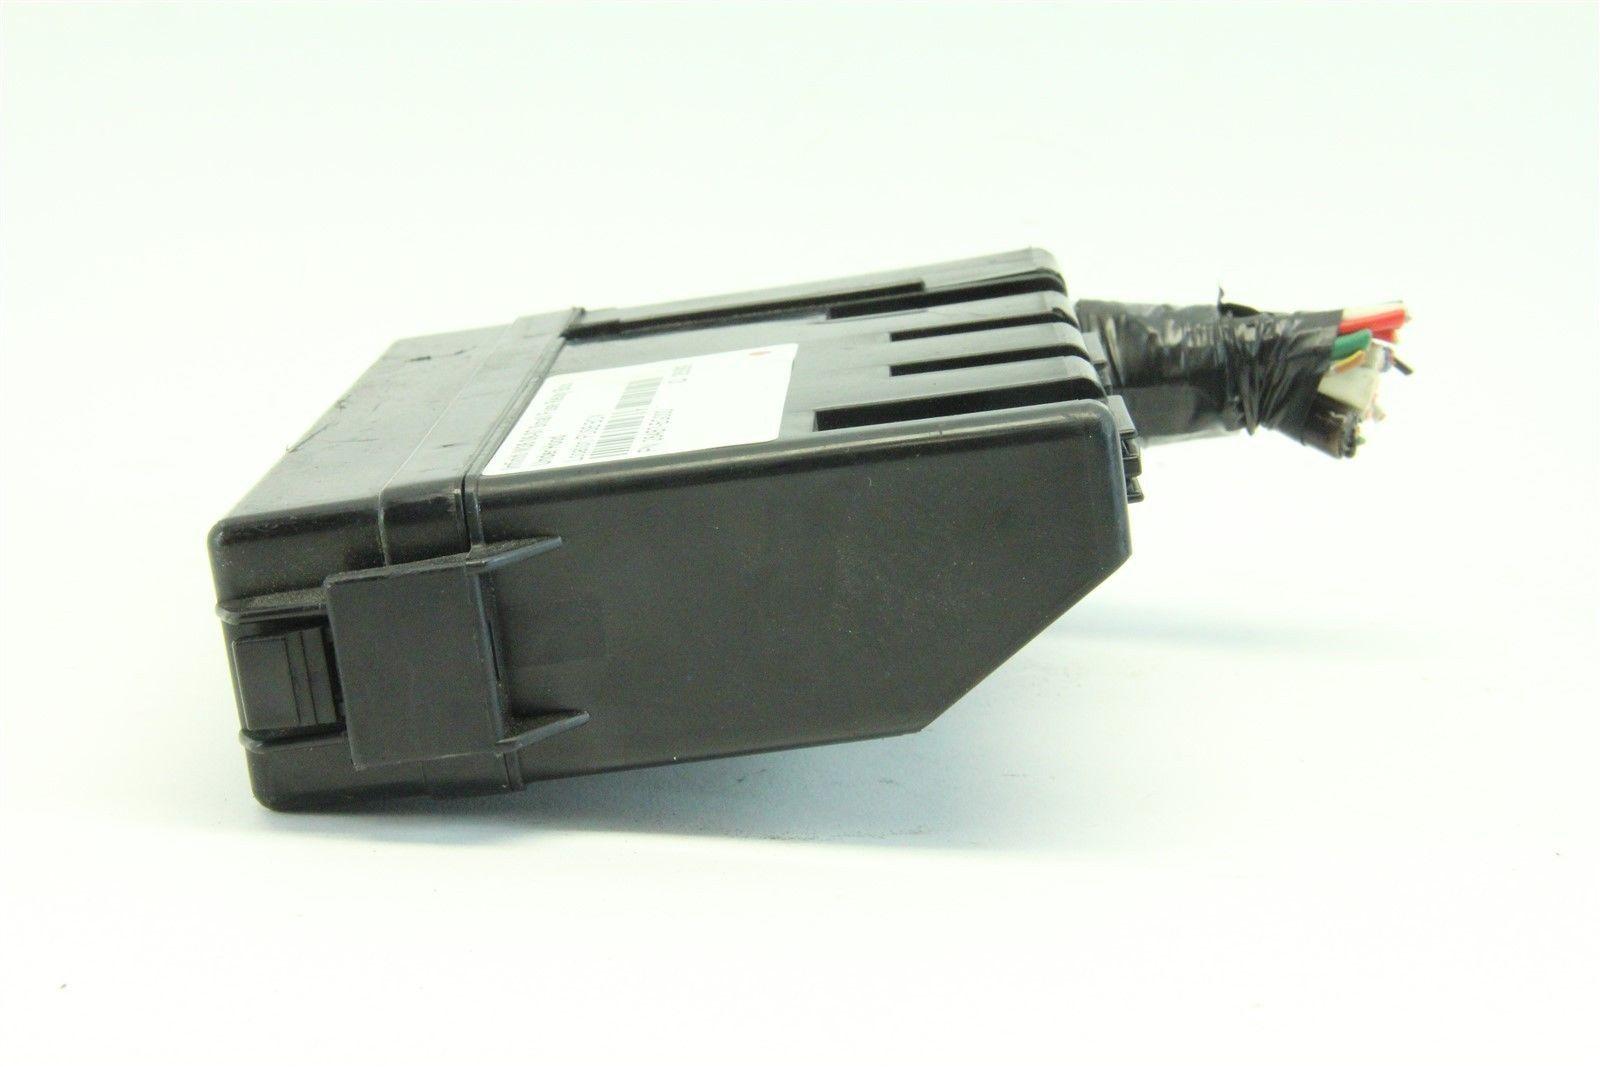 06 Infiniti M35 Fuse Box Wiring Diagrams Underhood Accessory 07 Small Relay Under Hood 284b7 2006